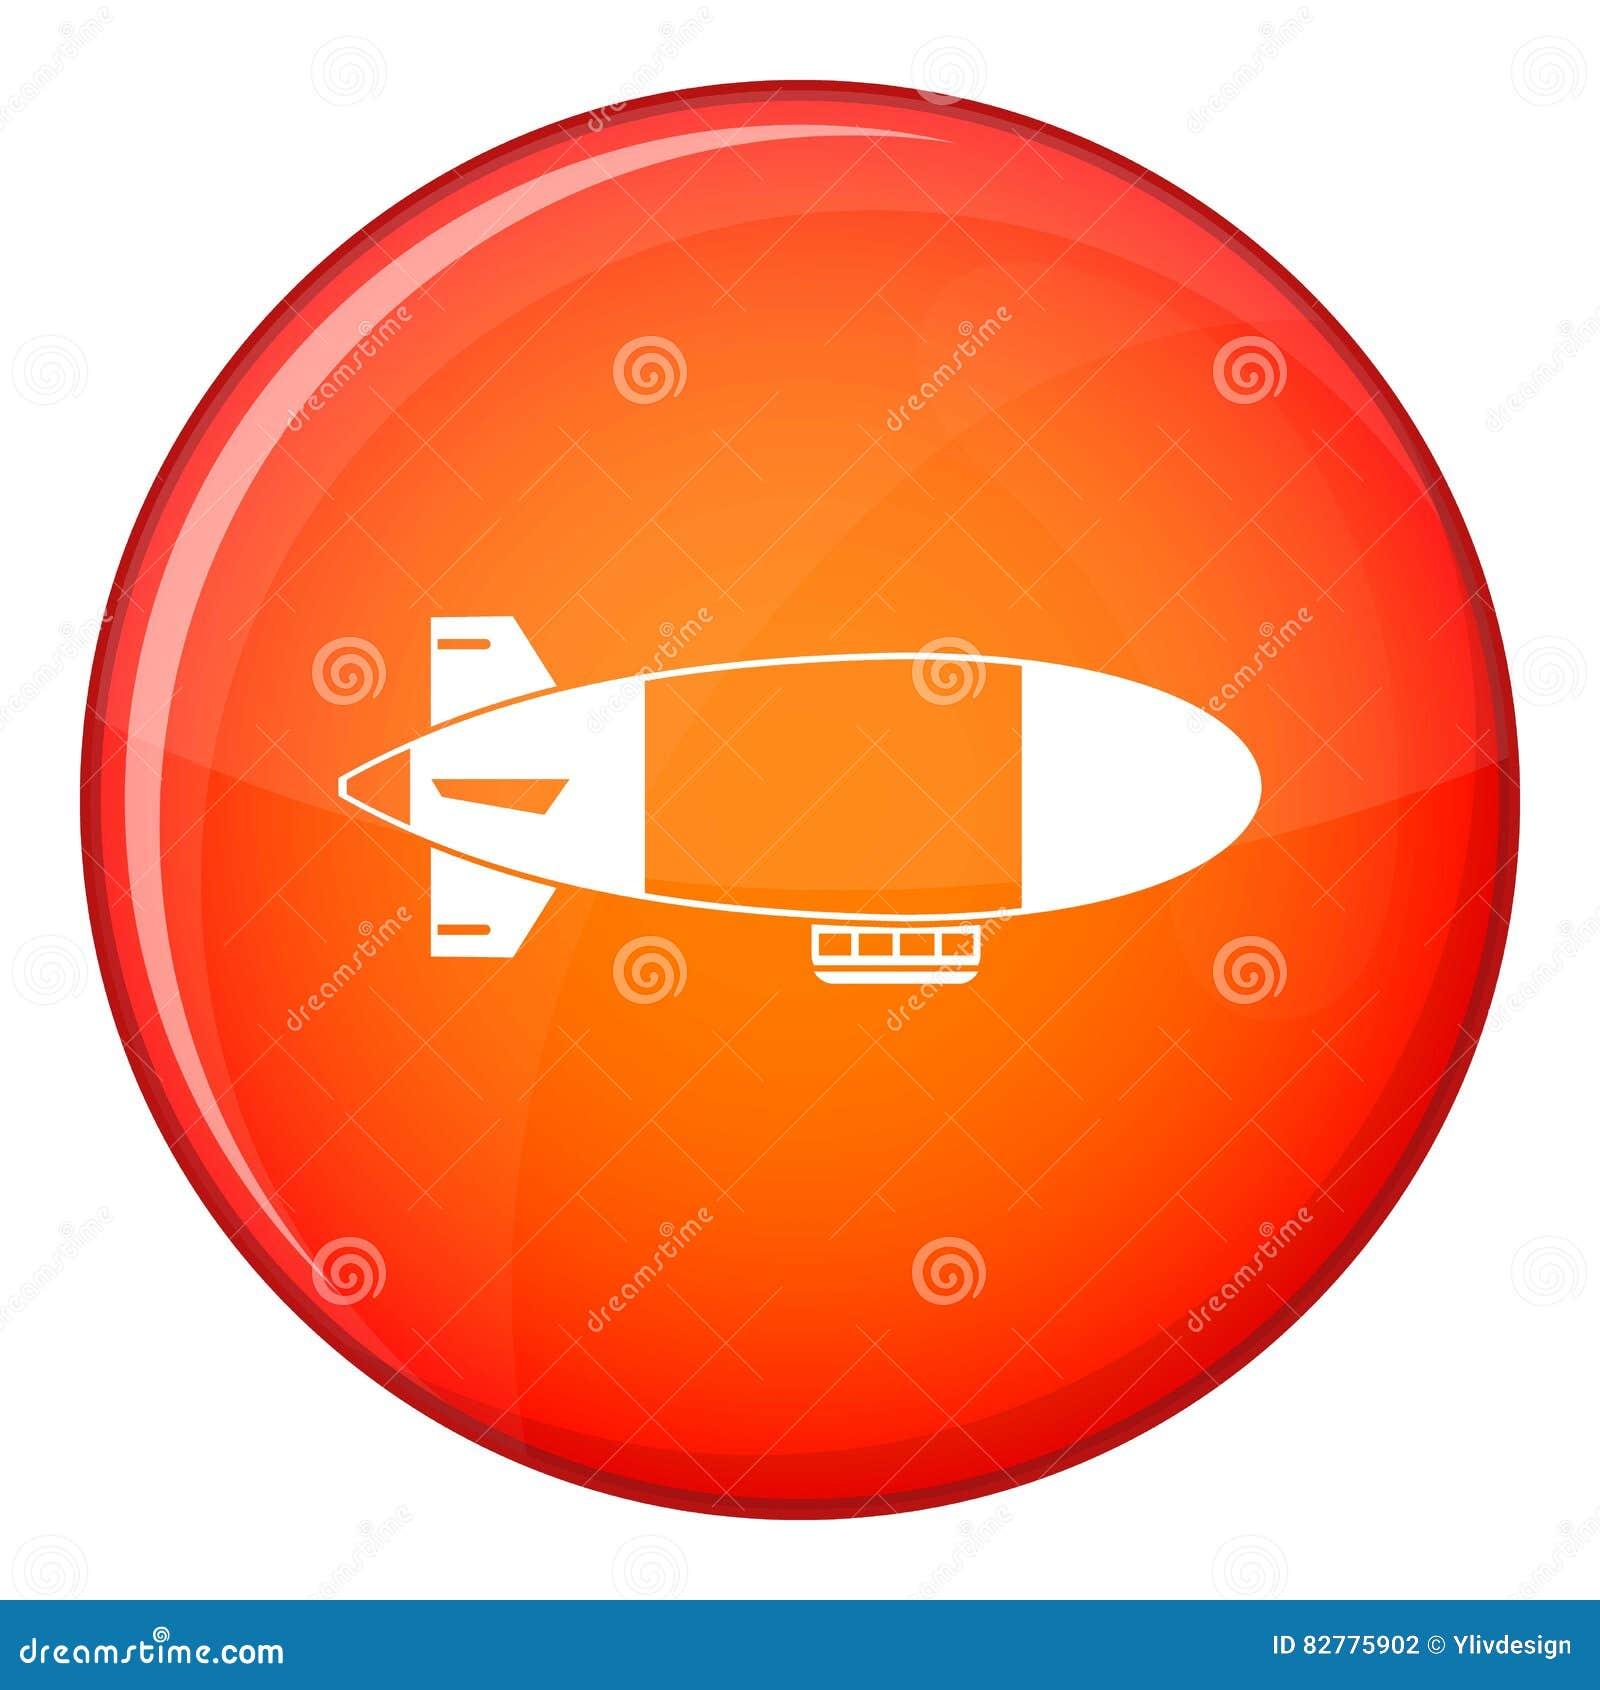 Aerostat Airship Icon, Flat Style Stock Vector - Illustration of